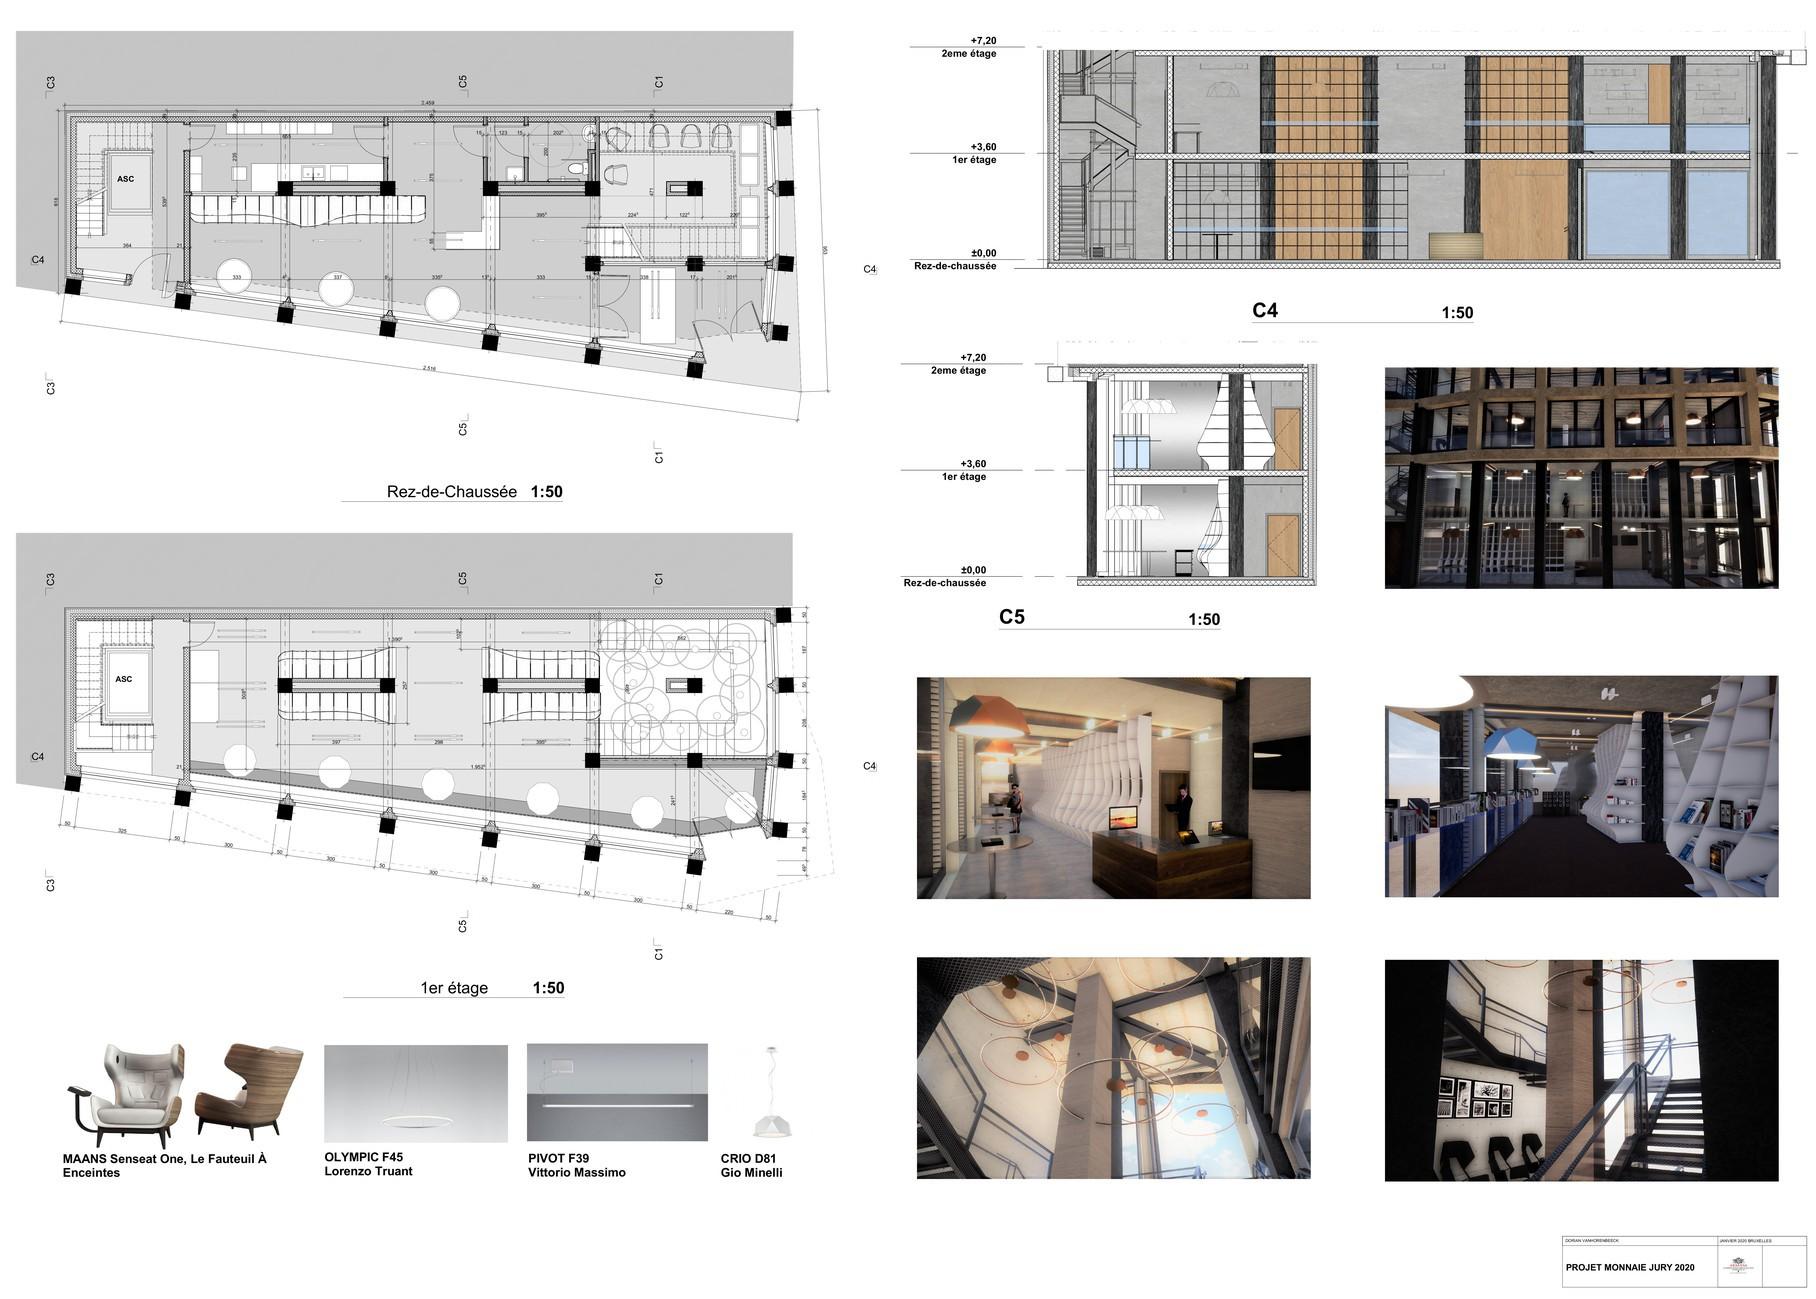 DORIAN-Jury-janvier_FINIpdf-2-_page-0001-ConvertImage